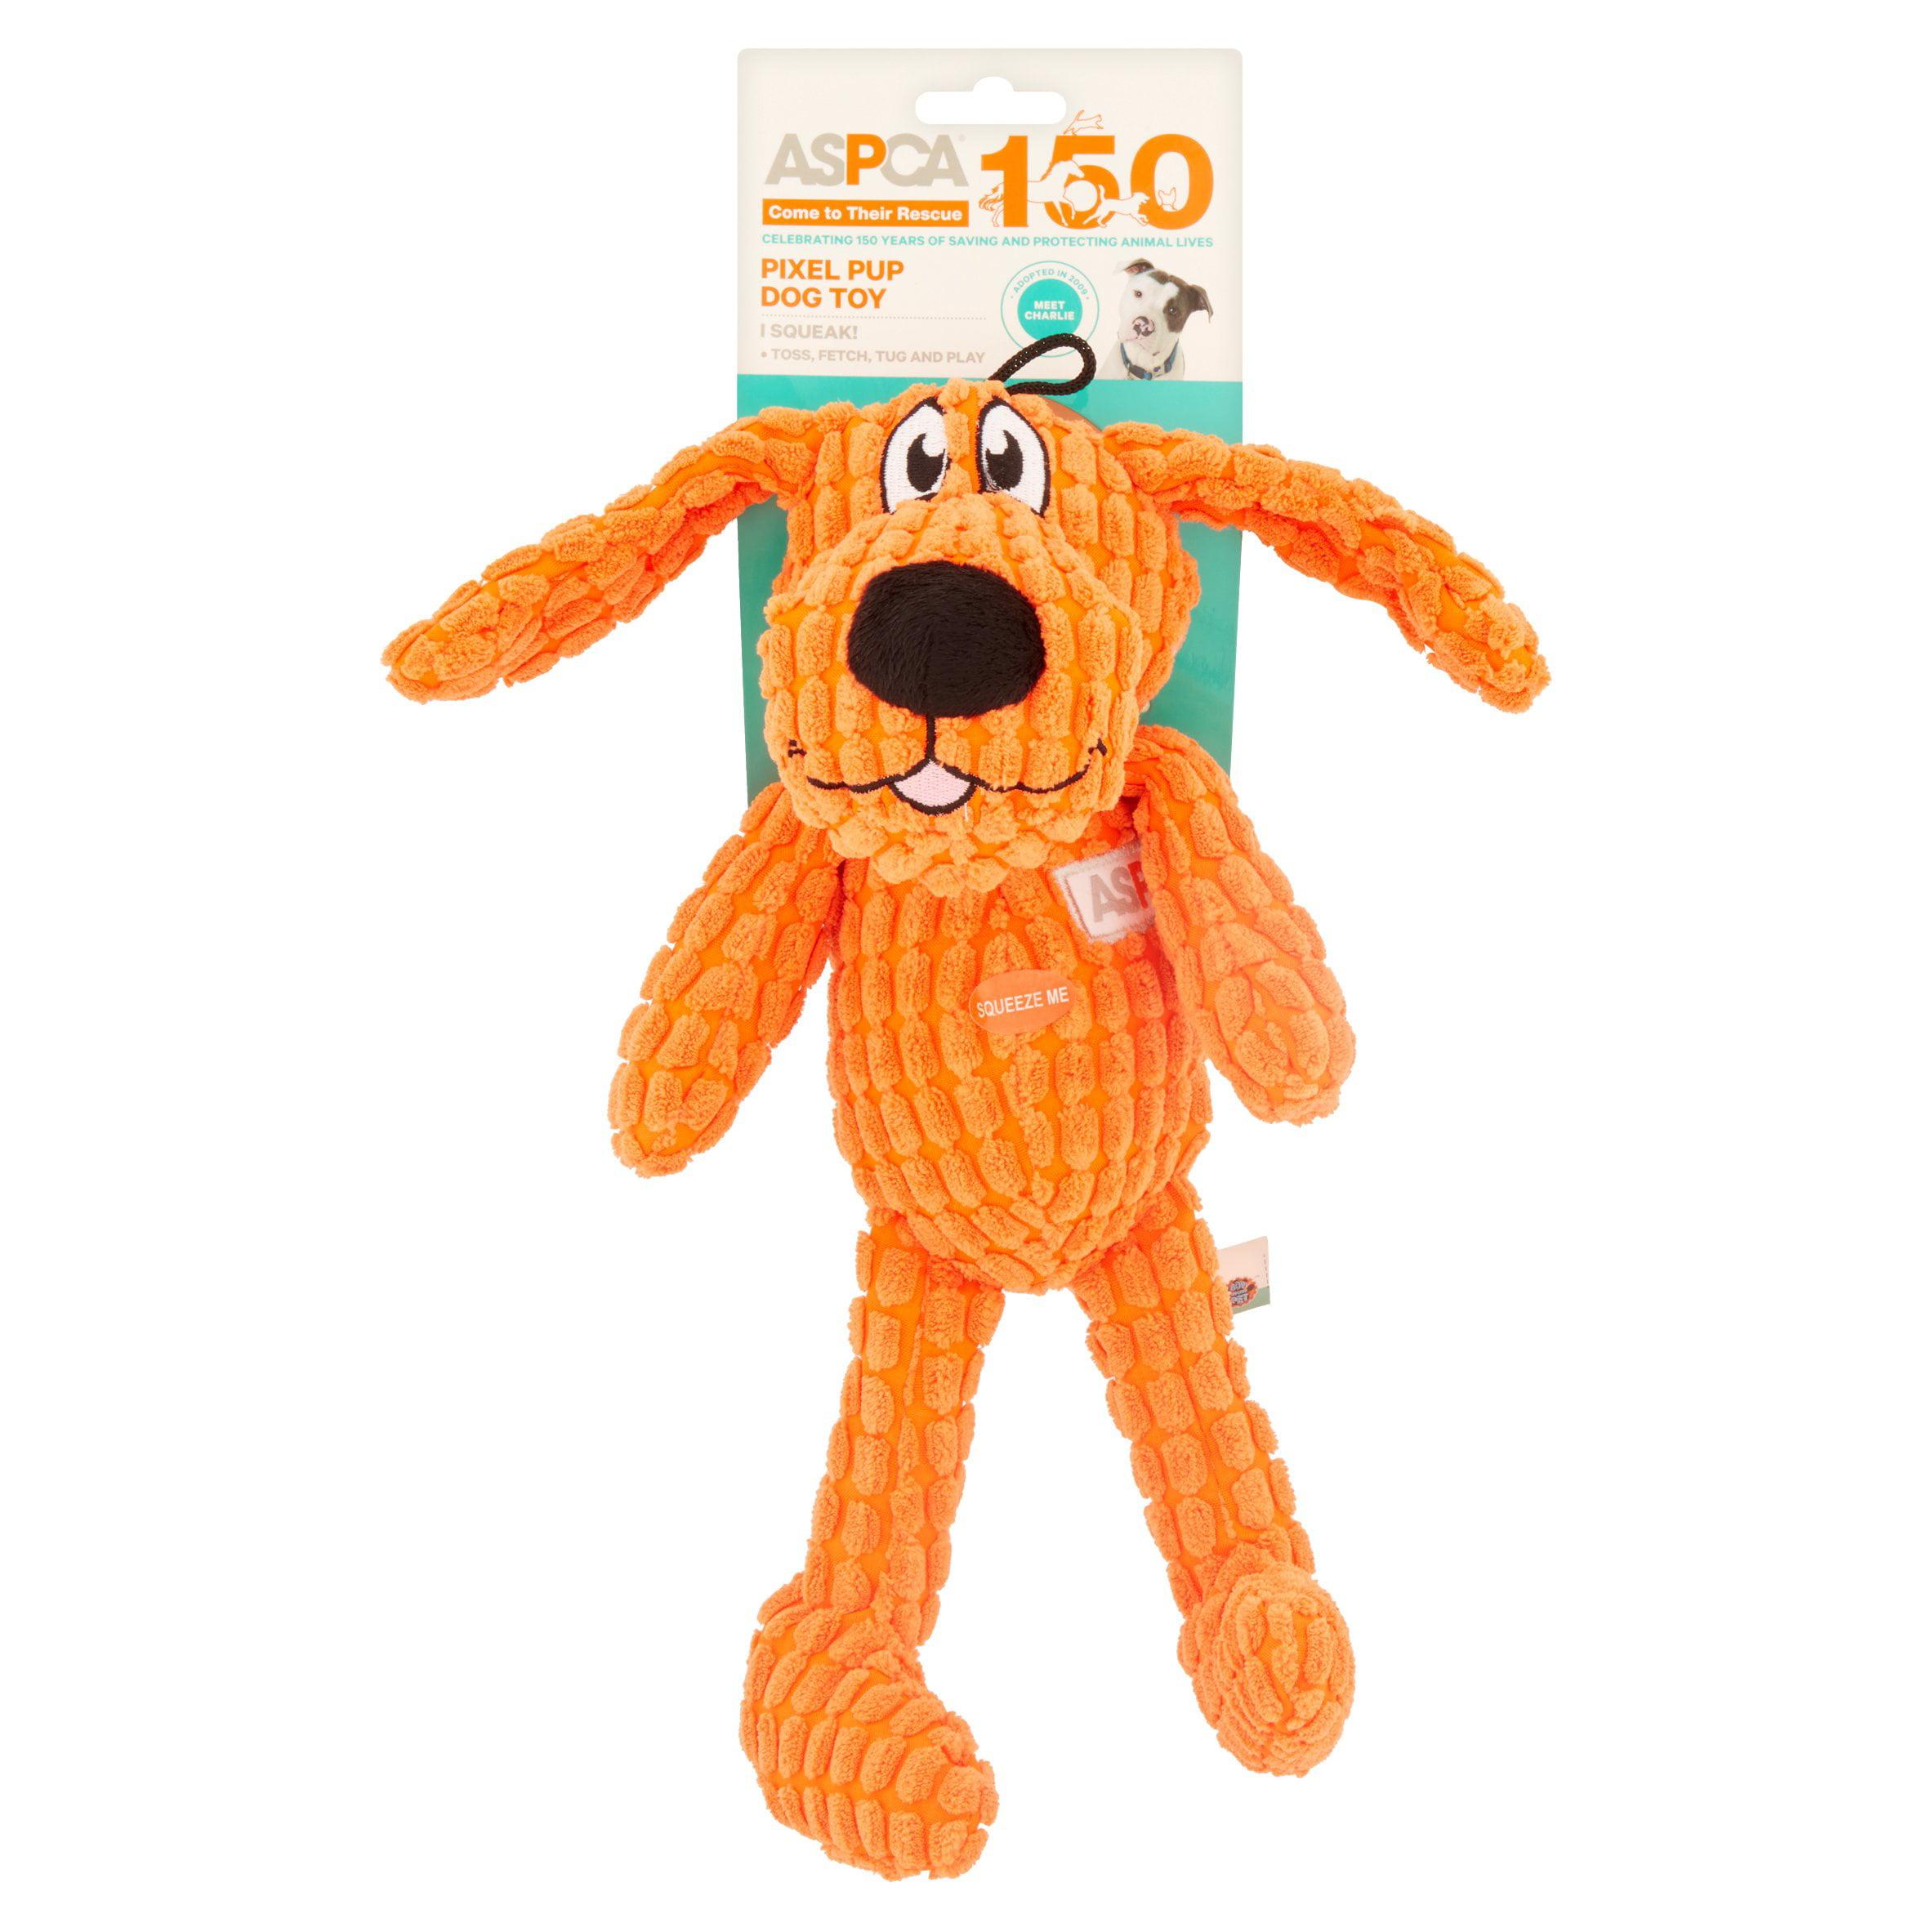 ASPCA Pixel Pup Dog Toy by European Home Designs, LLC